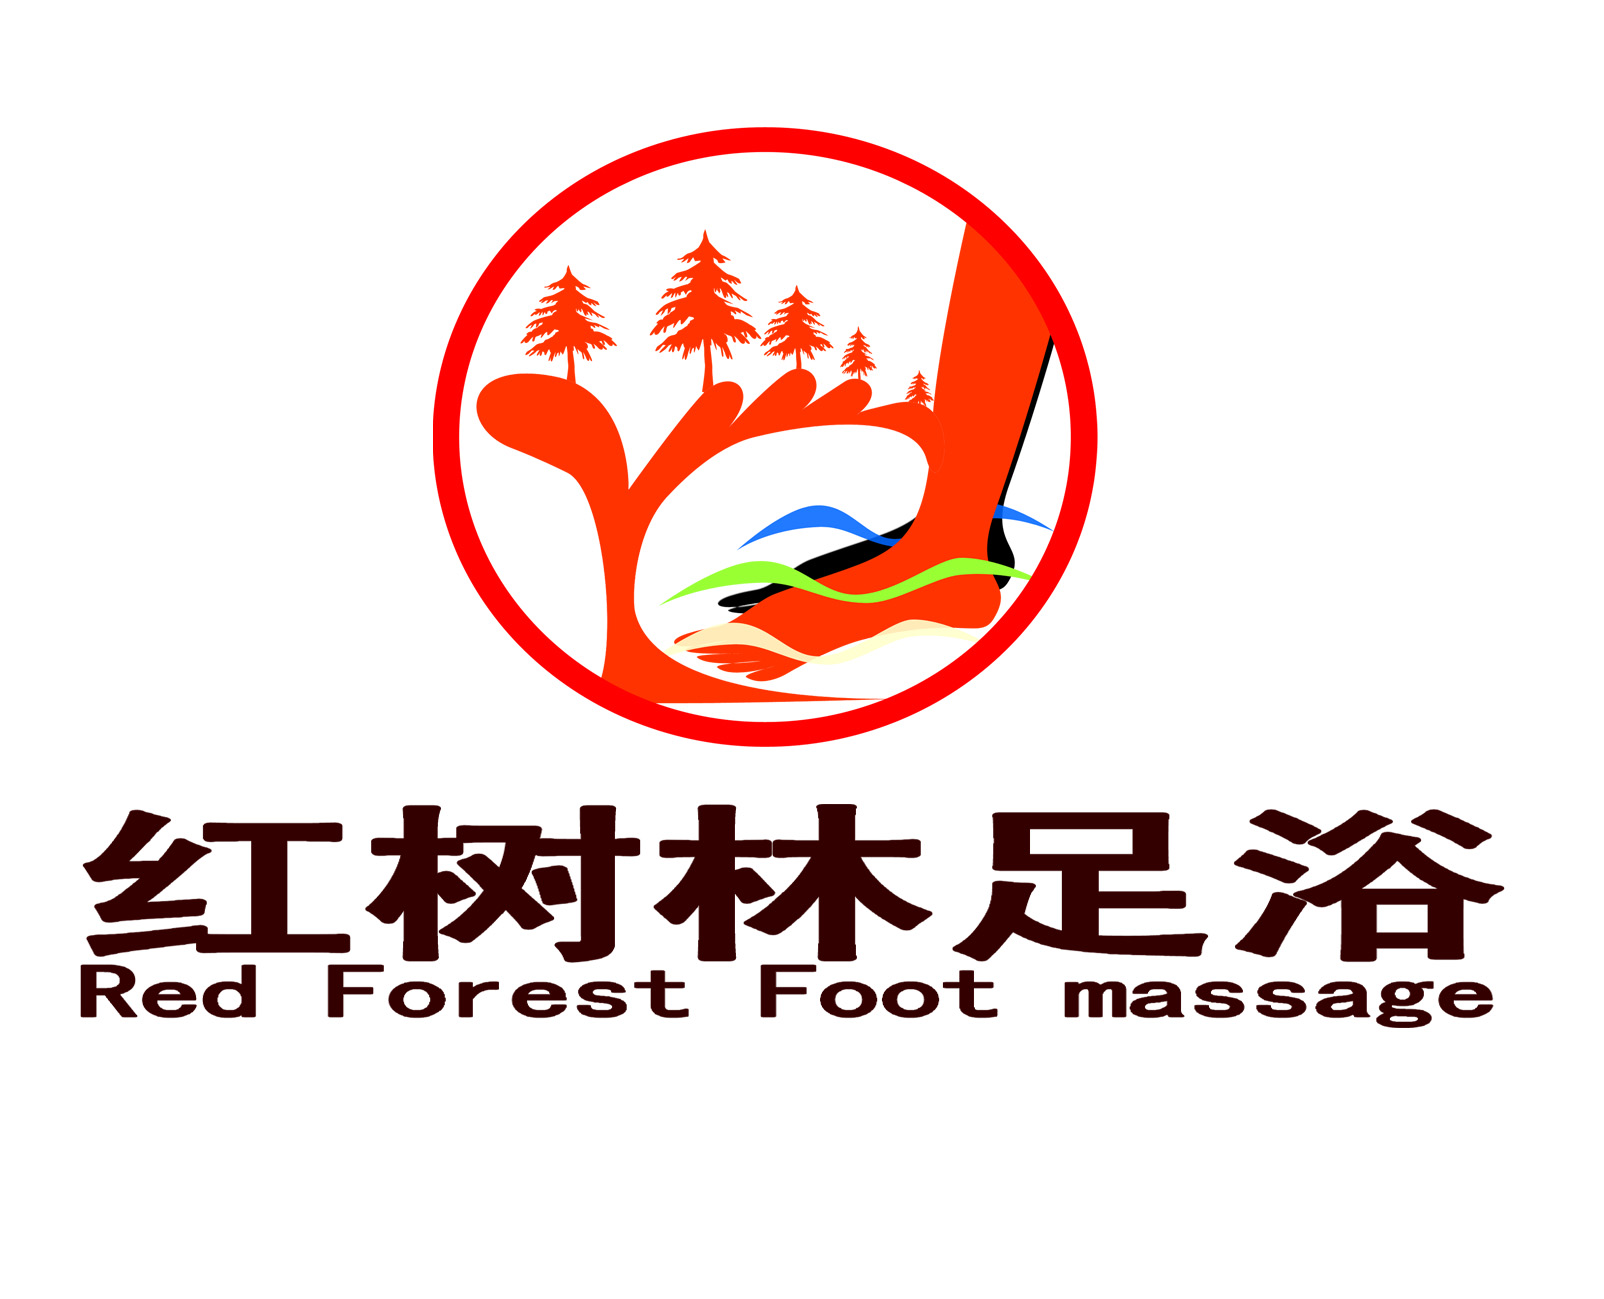 logo logo 标志 设计 图标 1604_1299